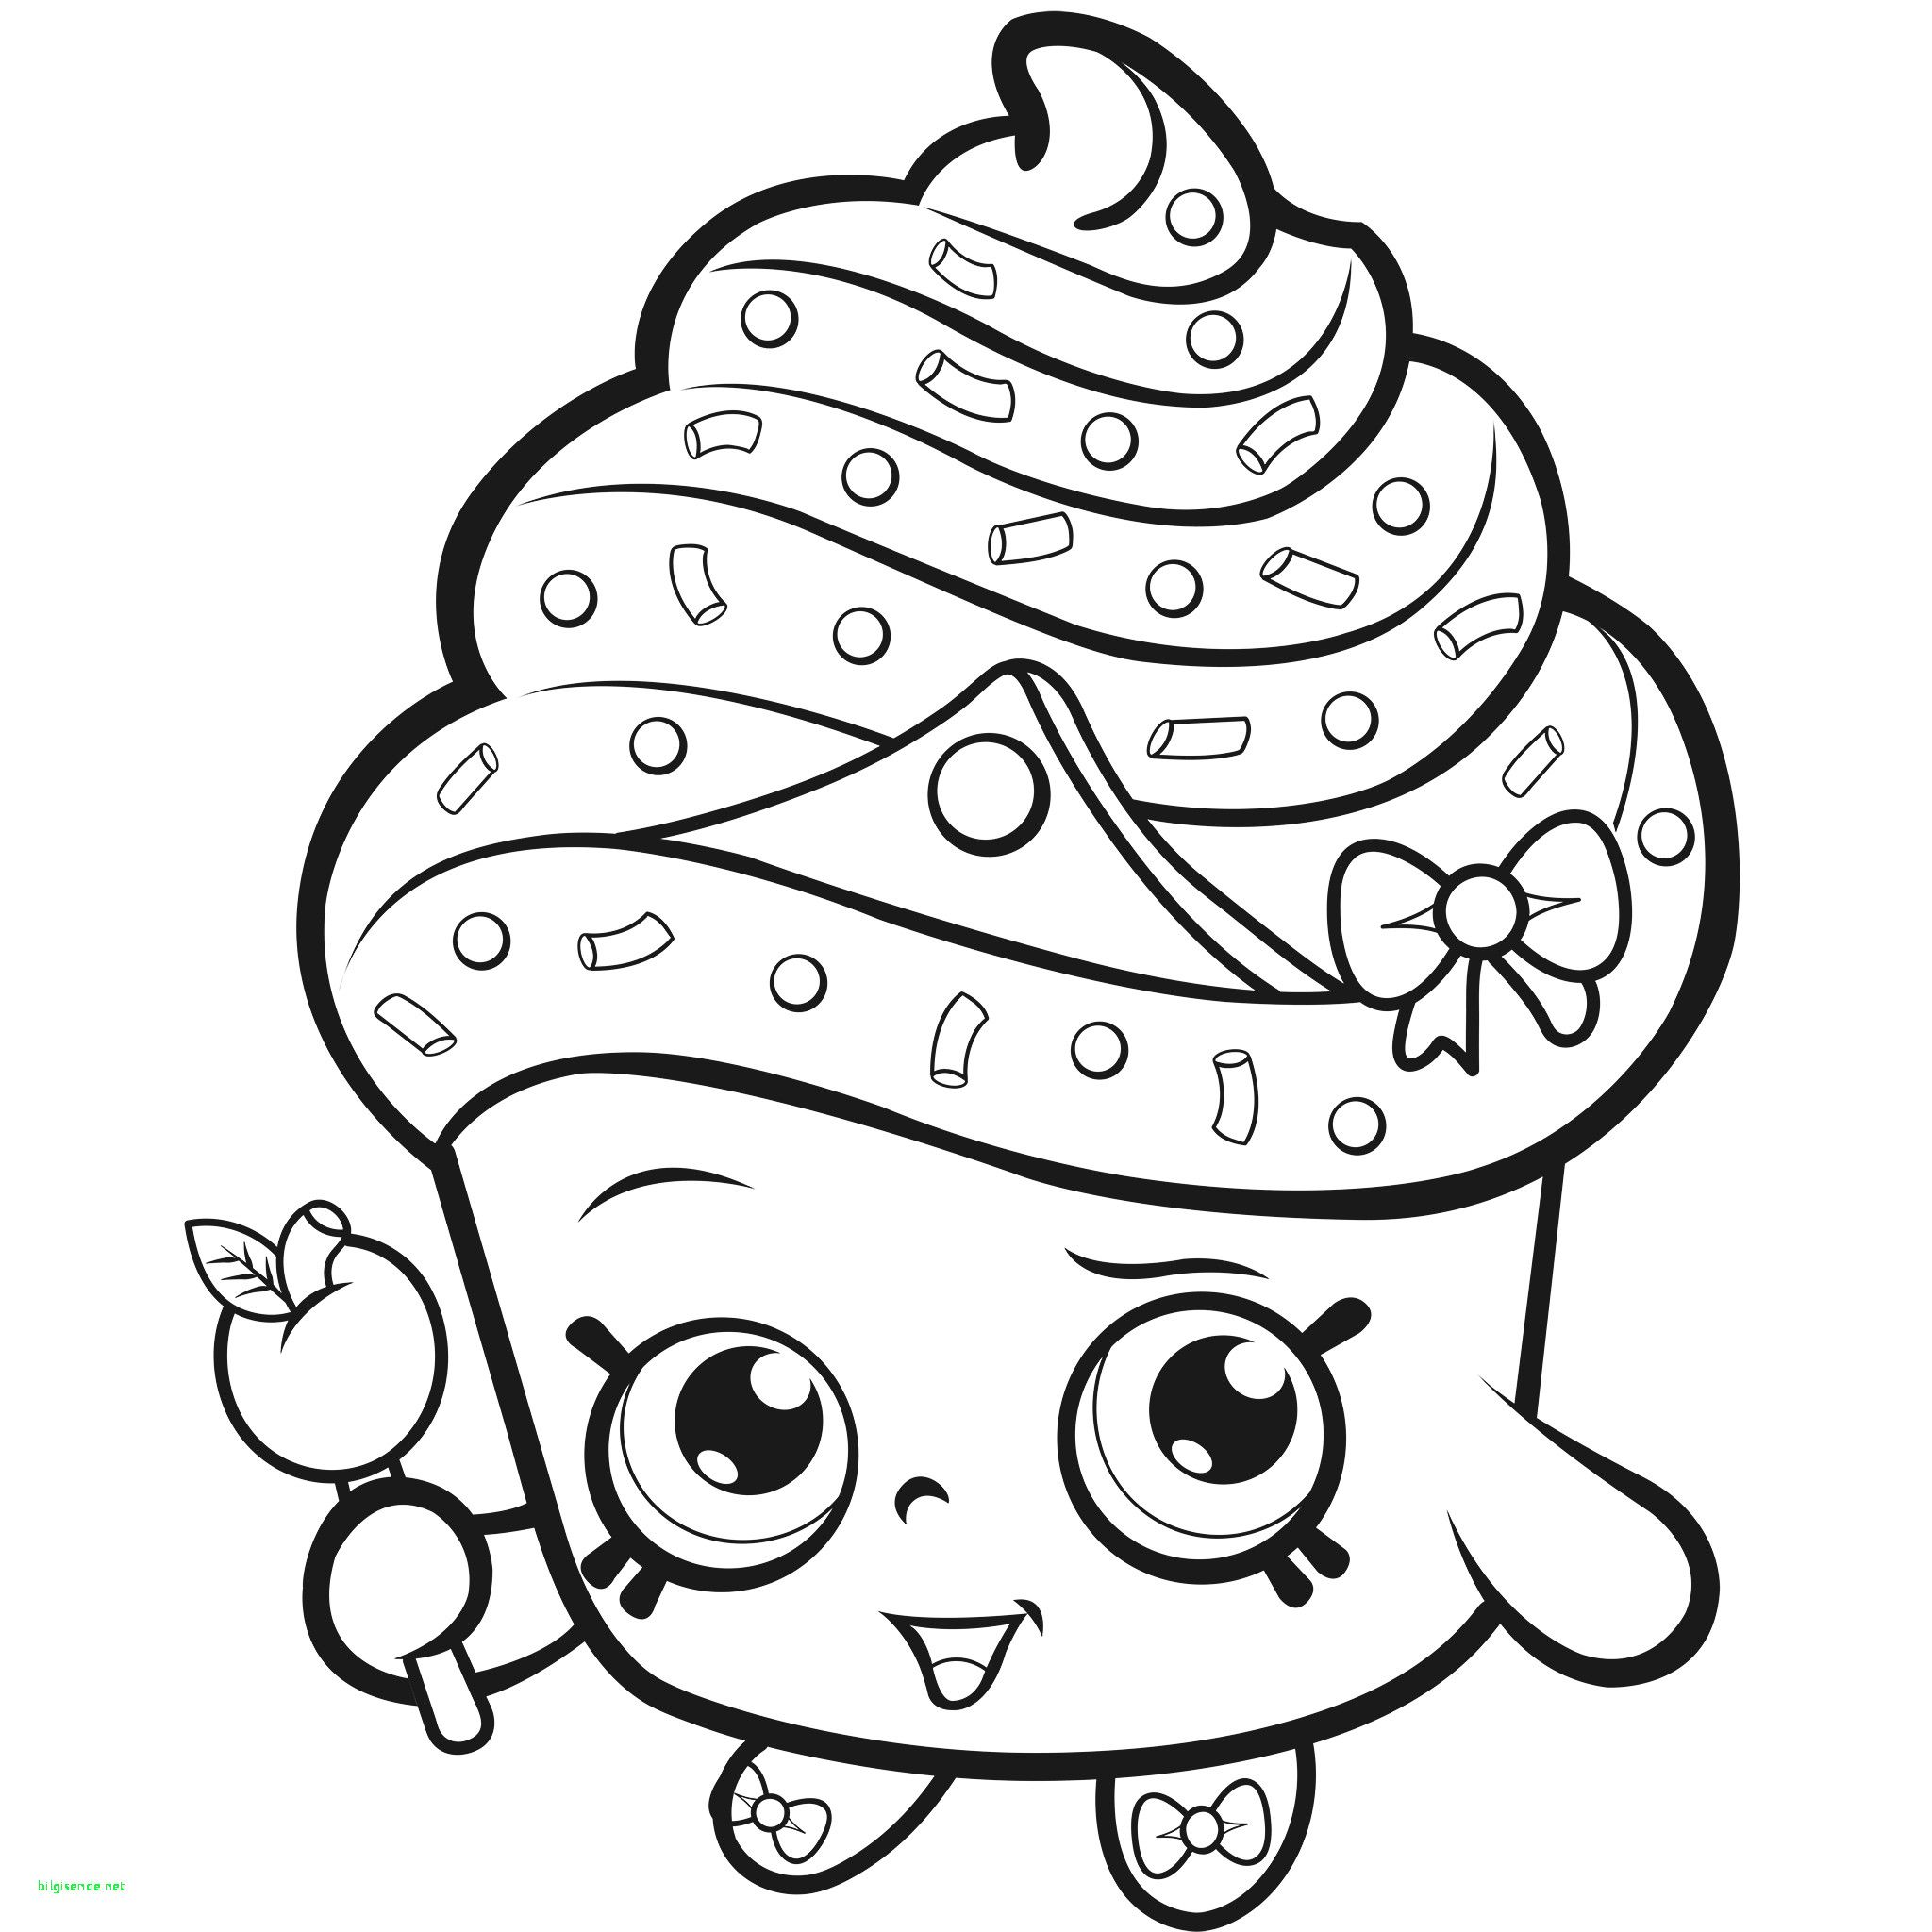 67 Beautiful Photography Of Candy Corn Coloring Page Check More At Https Www Mercerepc Com Candy Corn Coloring Halaman Mewarnai Lembar Mewarnai Buku Mewarnai